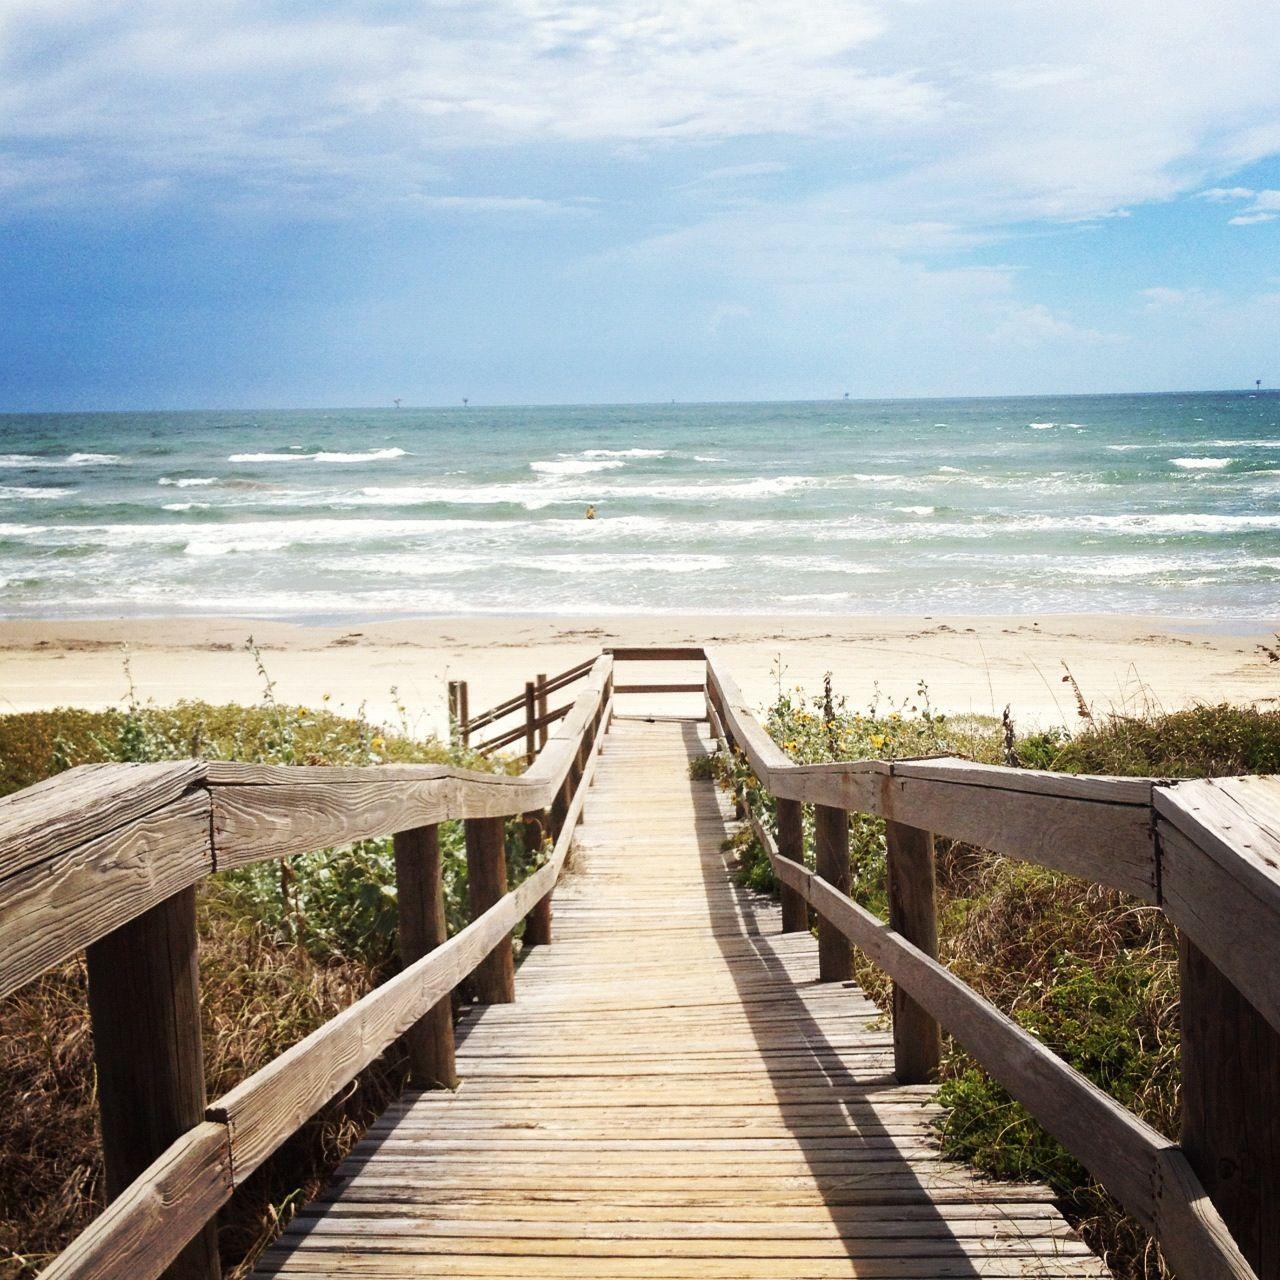 Beach House Rentals In Corpus Christi: Port Aransas Beach House Rental, Sites